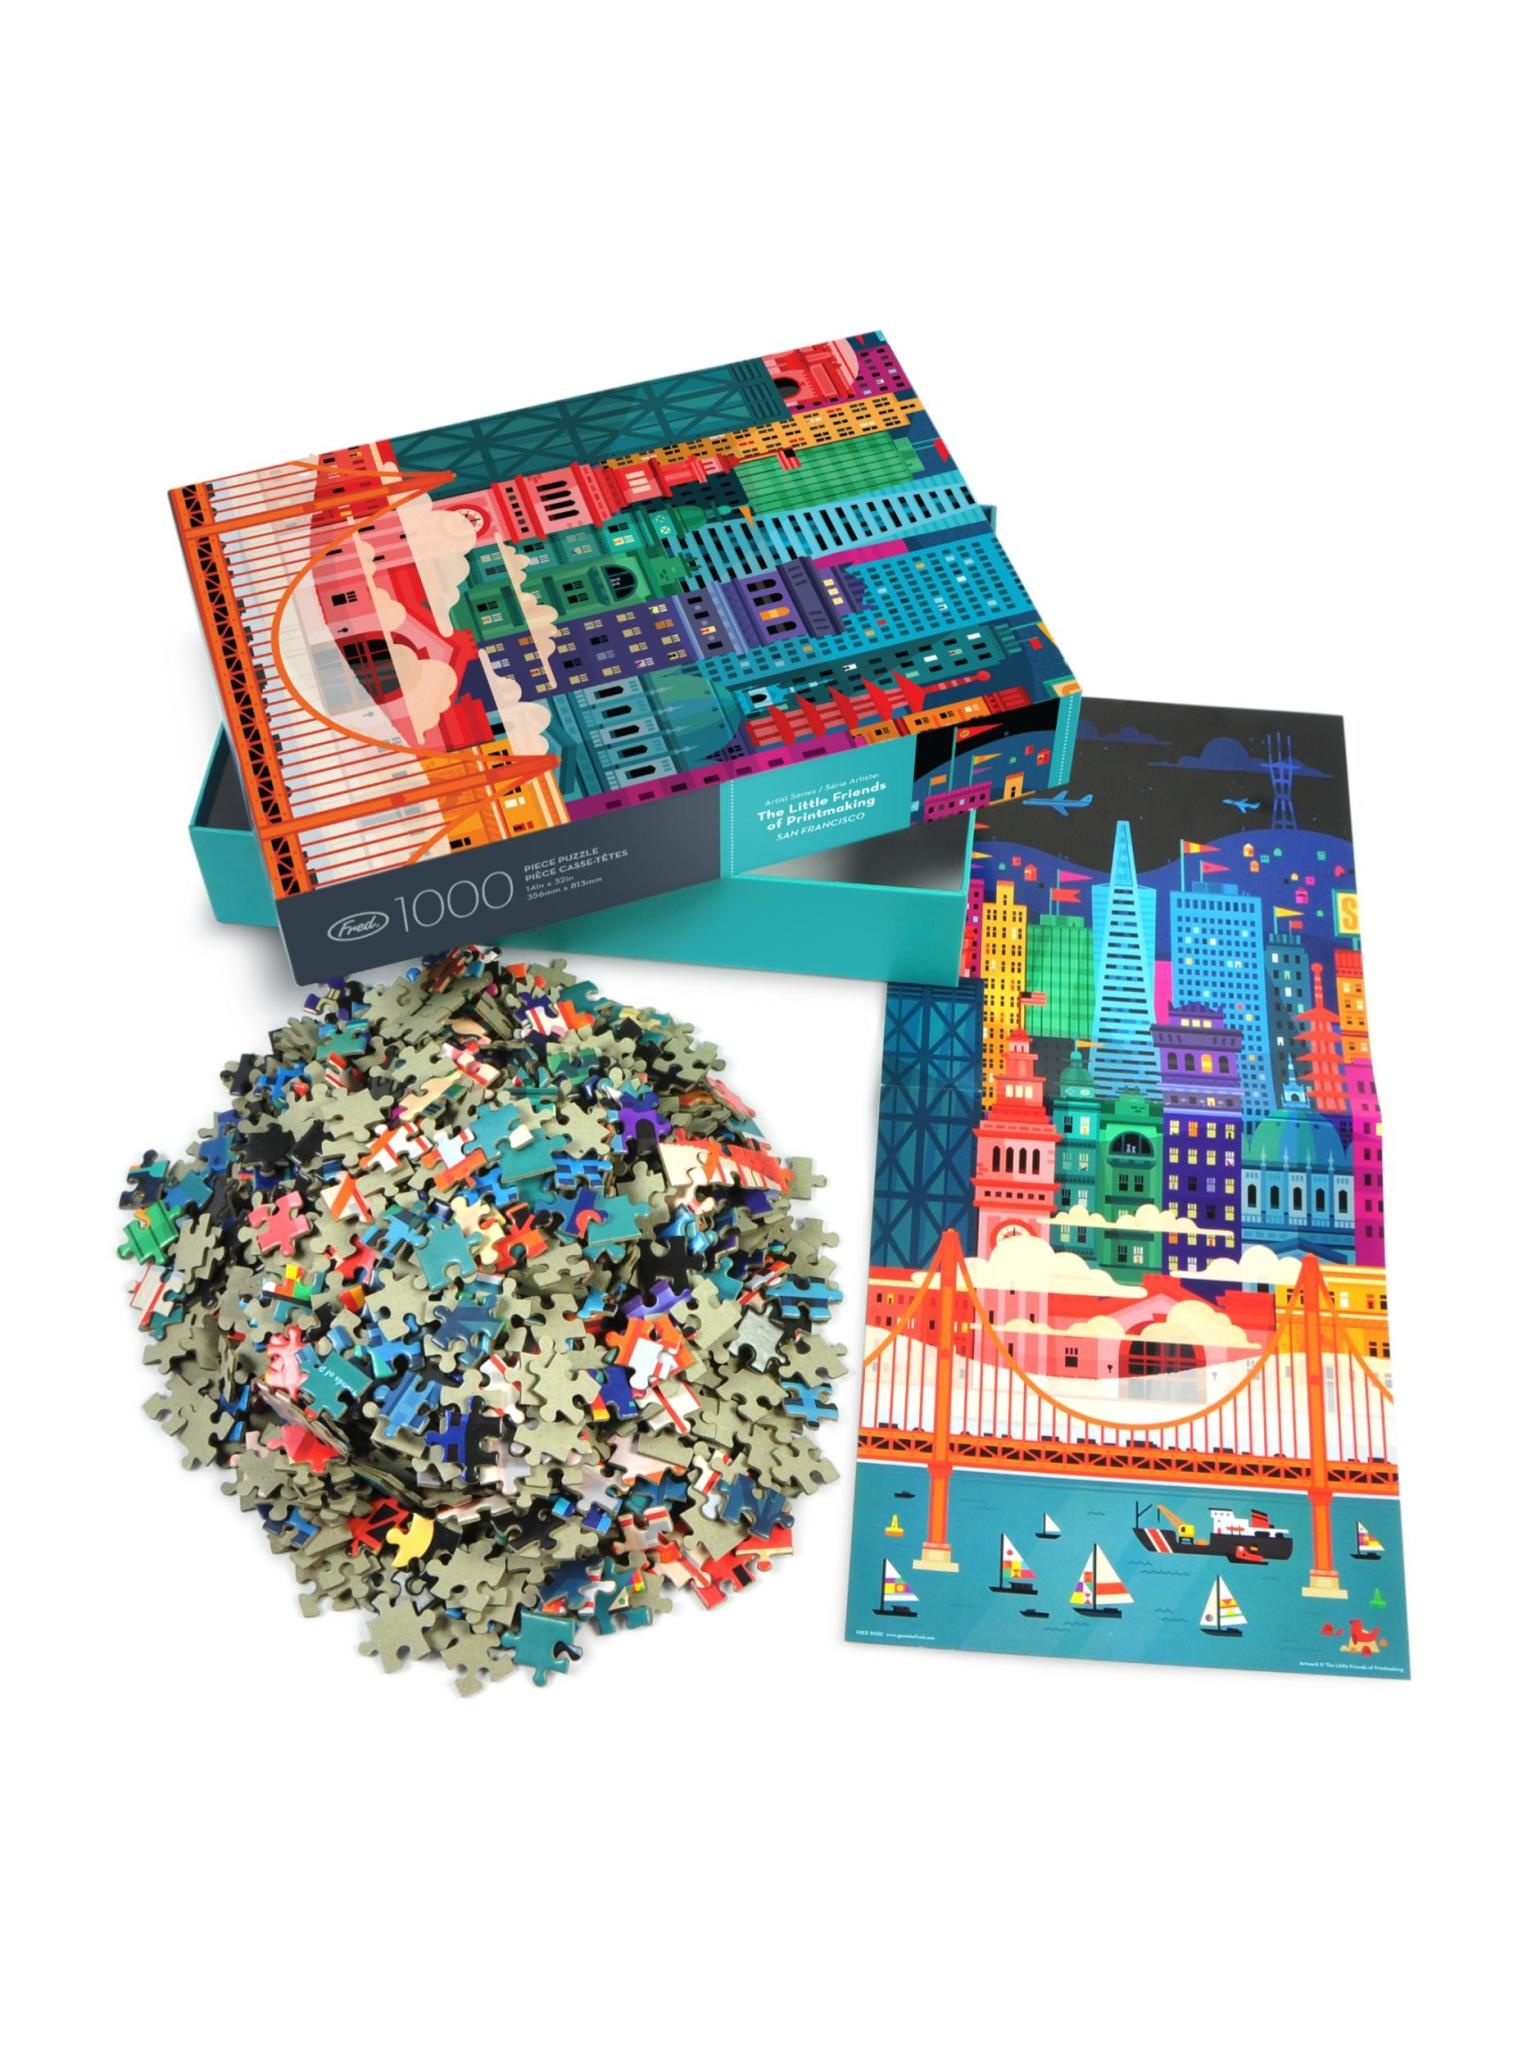 Fred San Fran 1000 Piece Puzzle